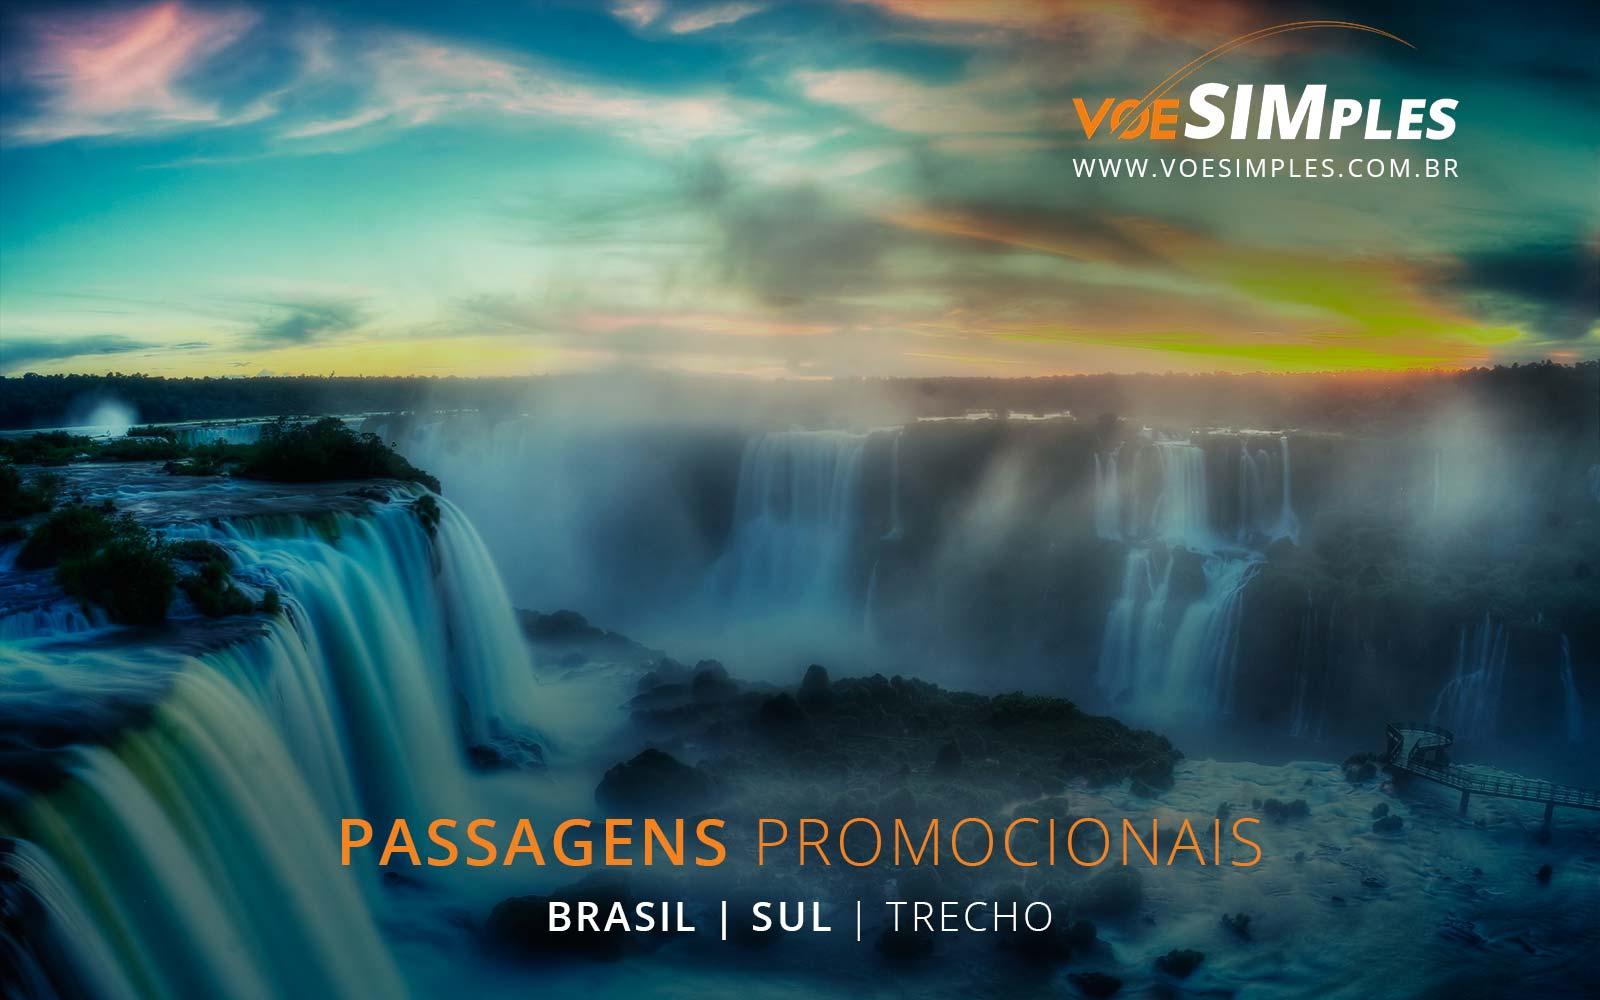 passagens-aereas-promocionais-brasil-voe-simples-passagem-aerea-promocional-barata-promocao-passagens-aviao-passagens-aereas-brasil-sul-trecho